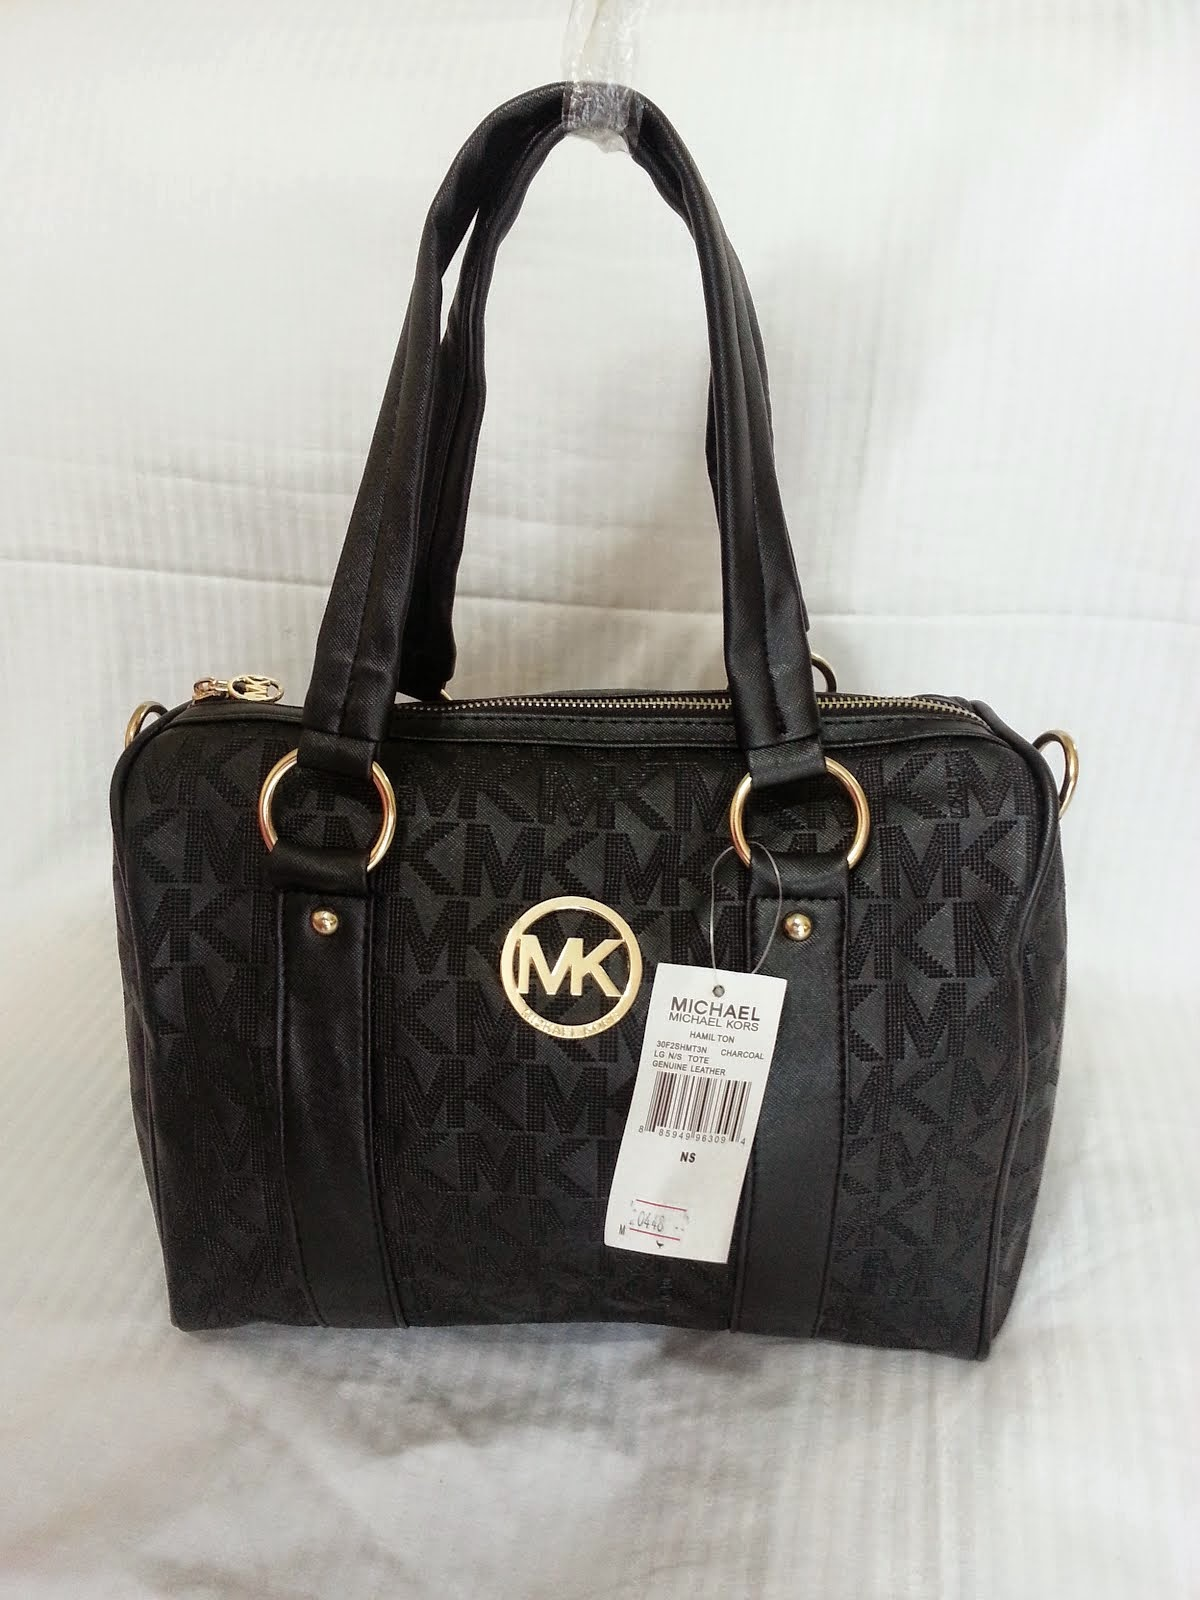 CARTERA MK NEGRA 0448